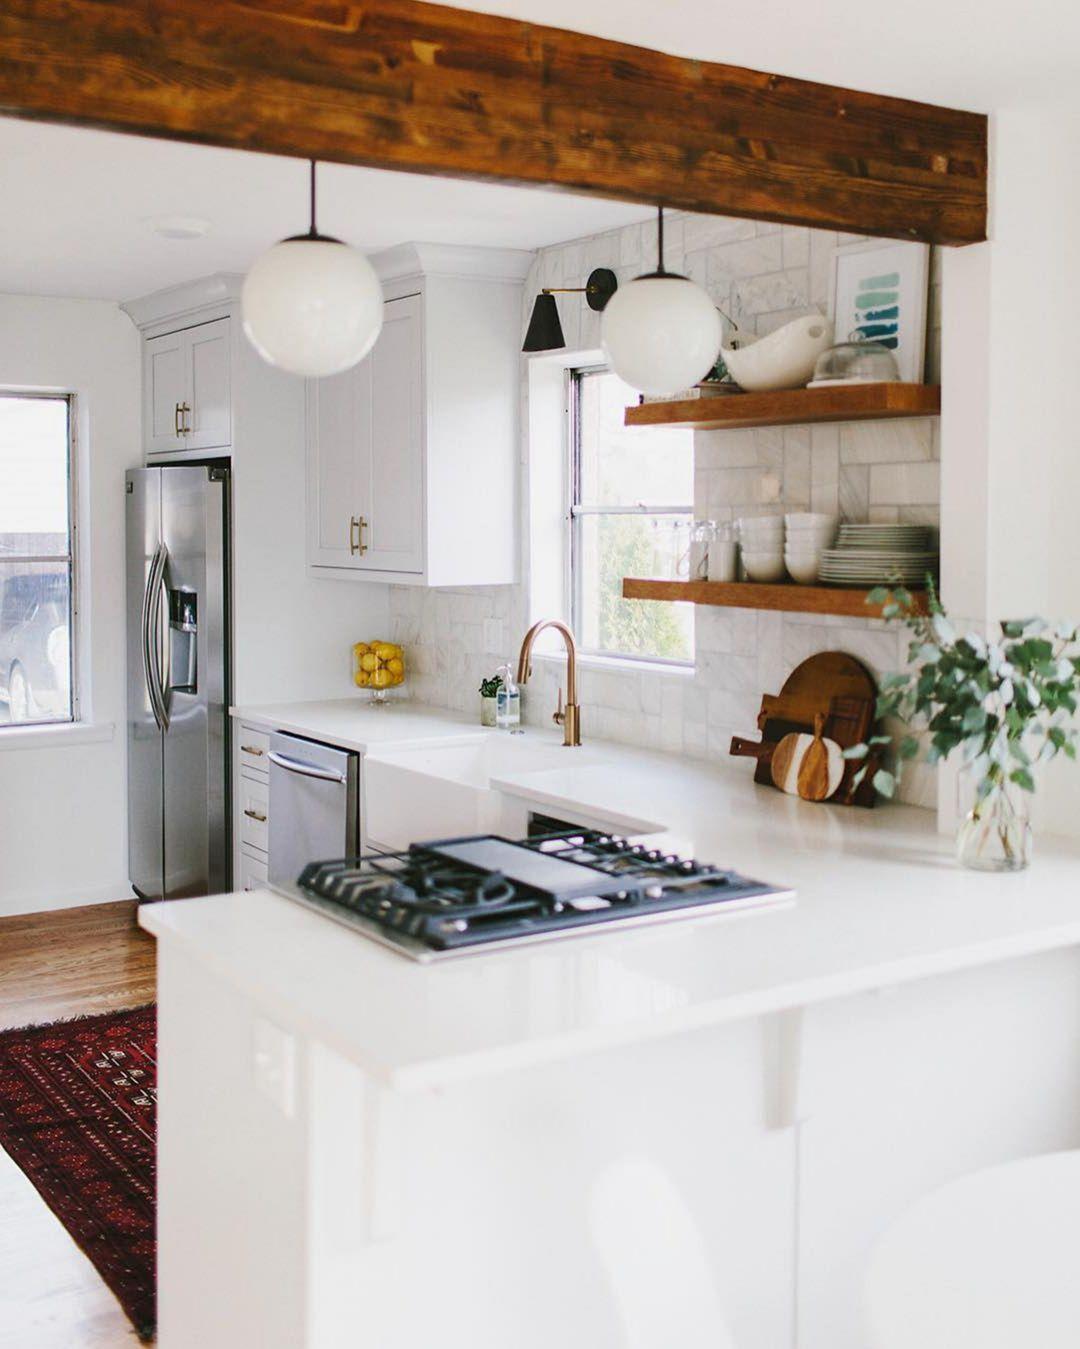 Epic 65 Amazing Small Modern Kitchen Design Ideas Https Decoor Net 65 Amazing Small Modern Kitchen Small Cottage Kitchen Kitchen Layout Small Kitchen Decor